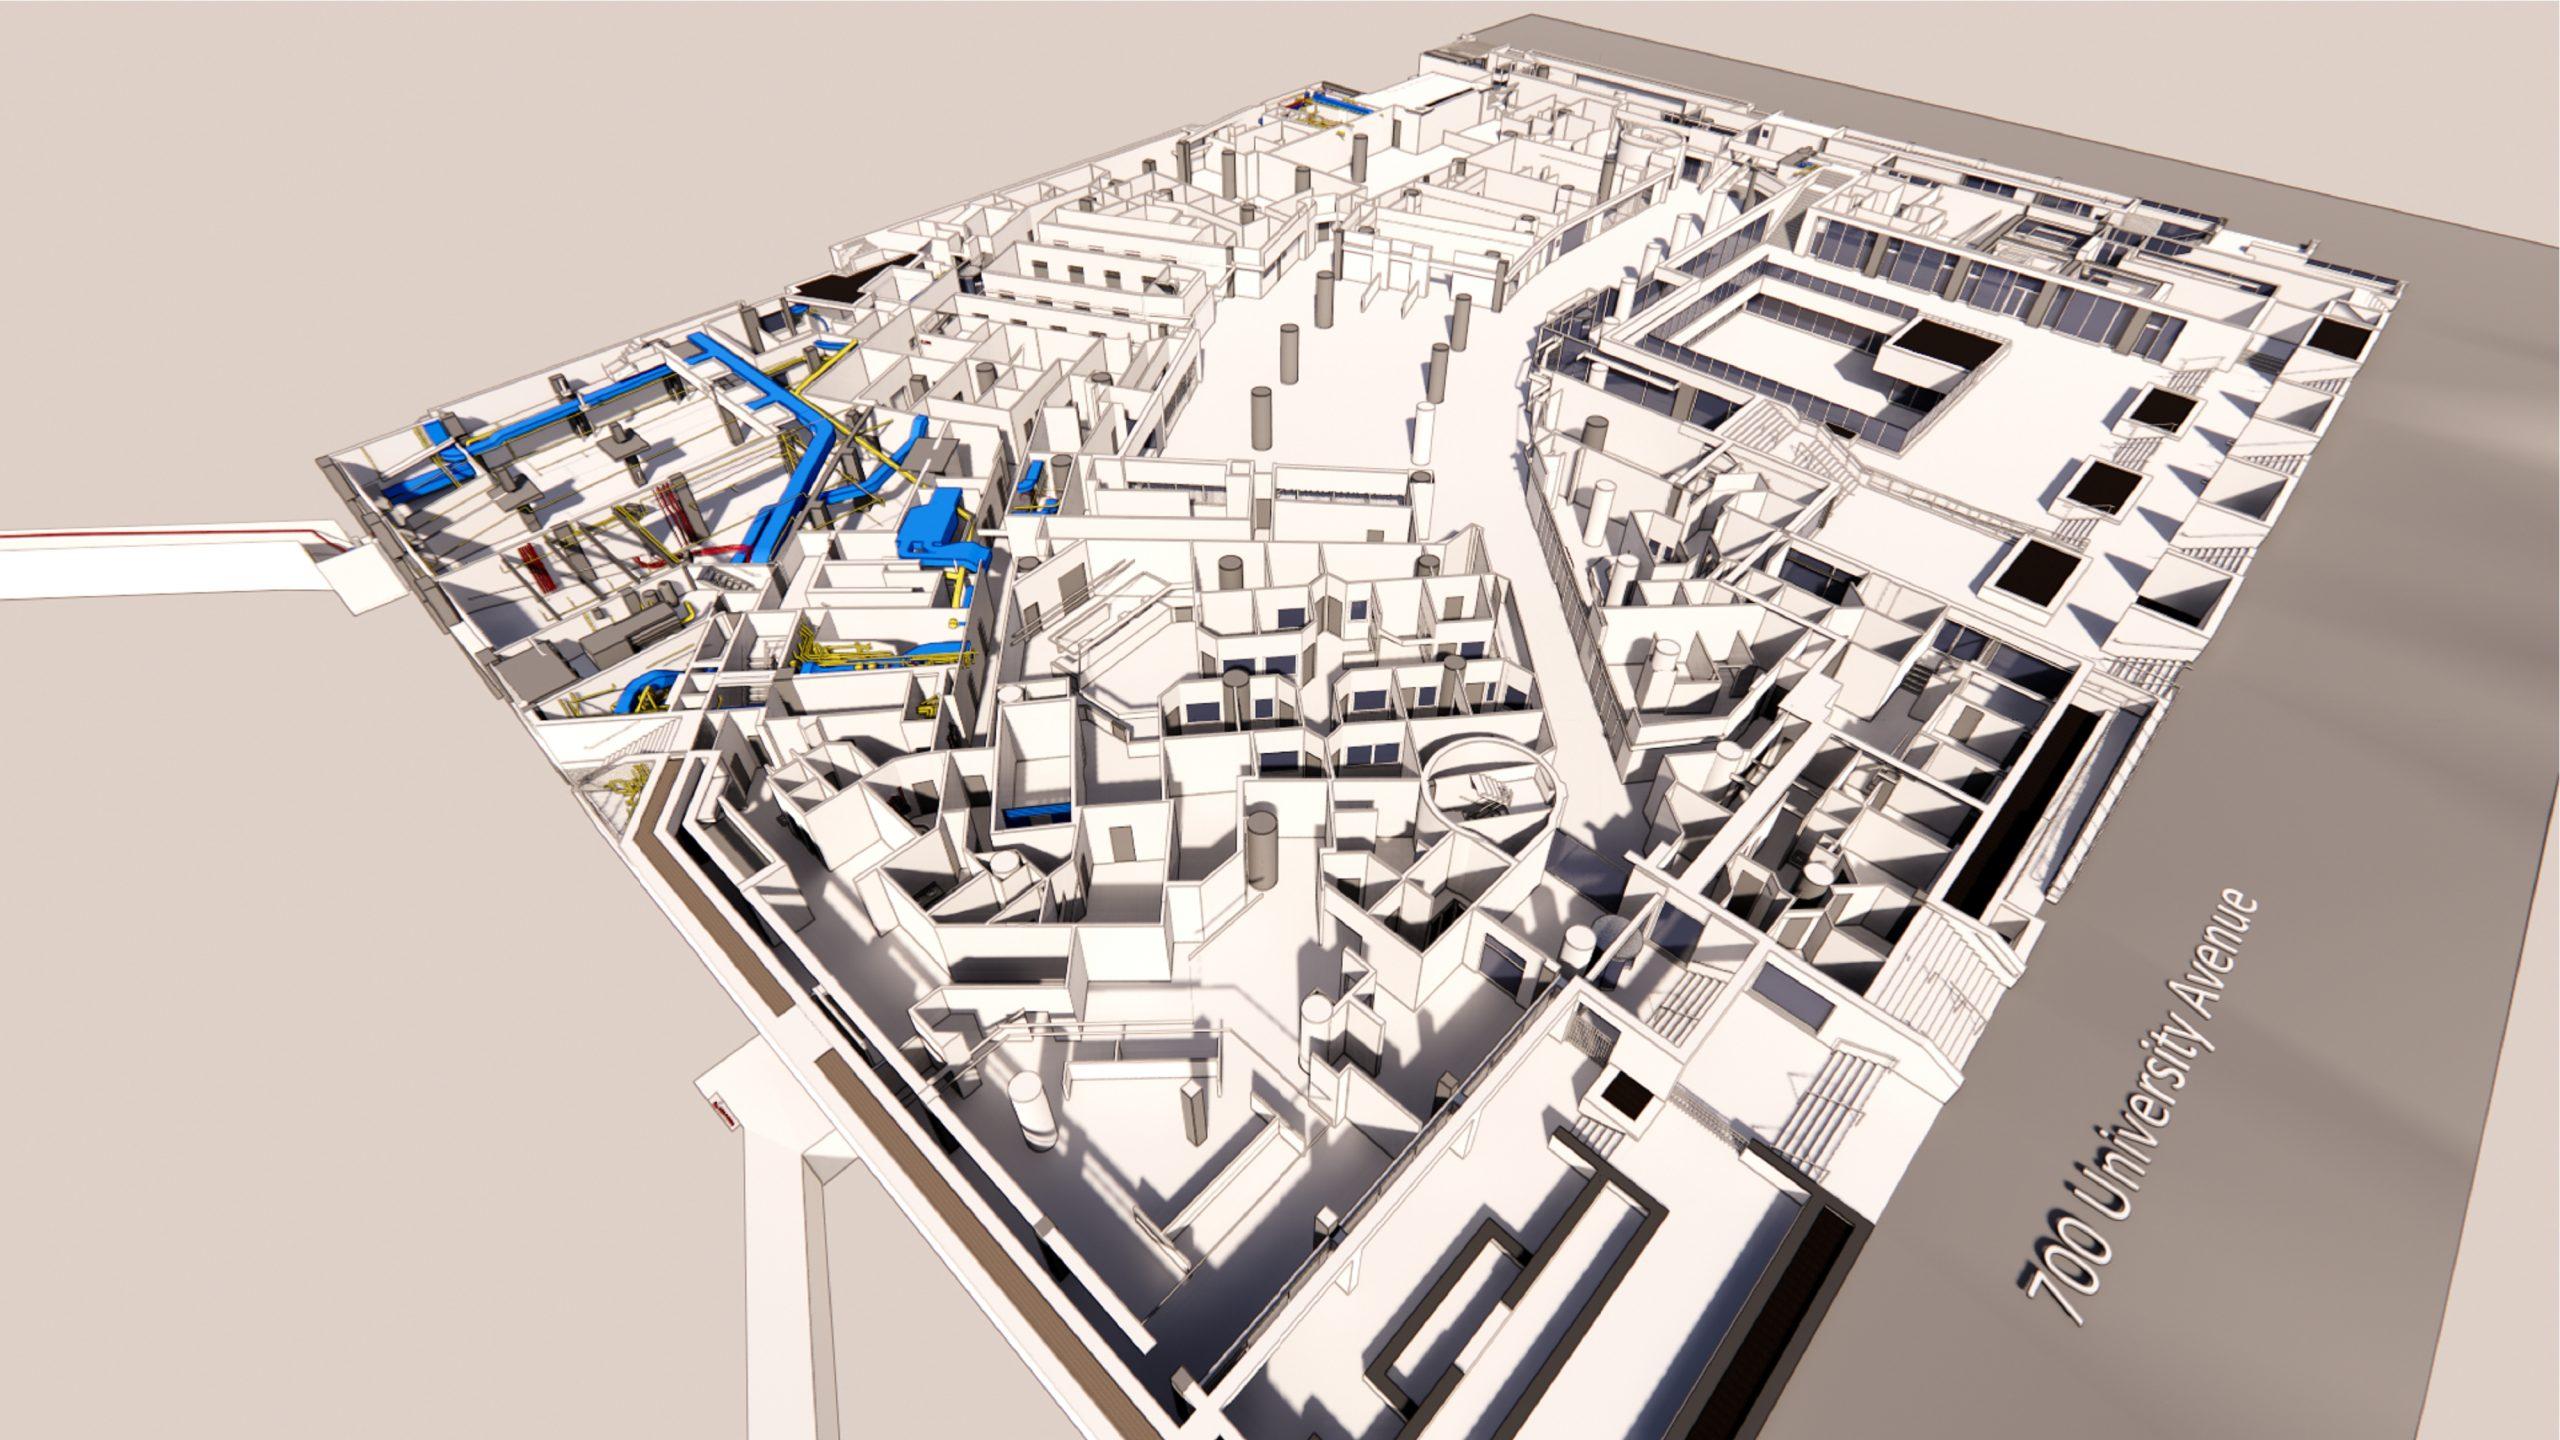 3D rendering of utilities, 700 University Avenue, Toronto